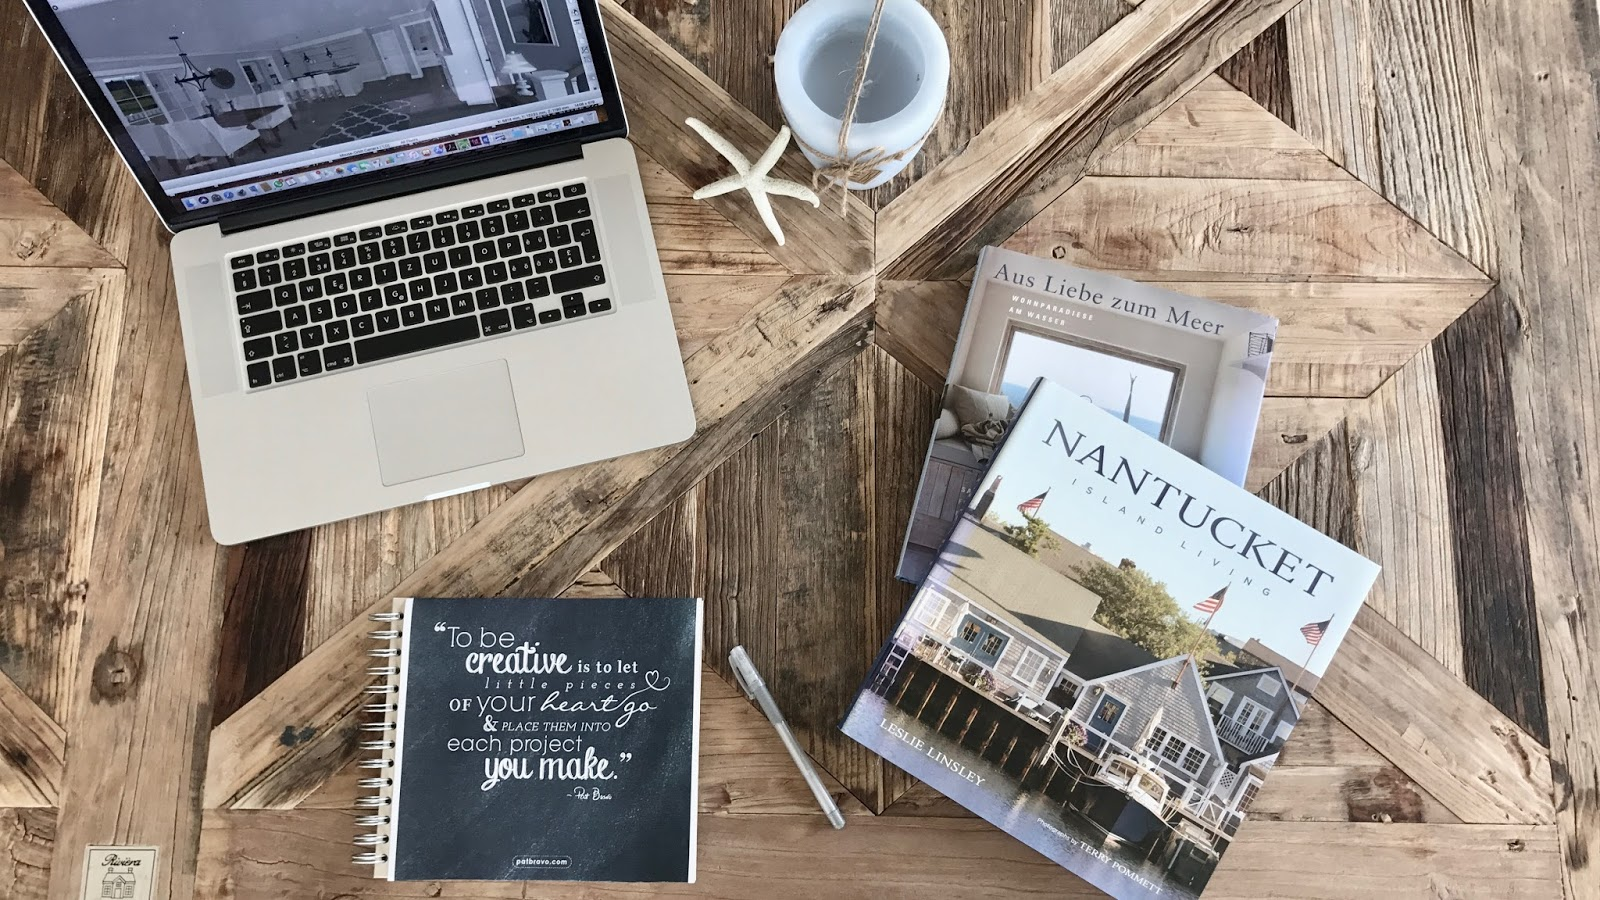 hauspl ne f r new england h user schwedenh user von driftwood design beachhouse living. Black Bedroom Furniture Sets. Home Design Ideas